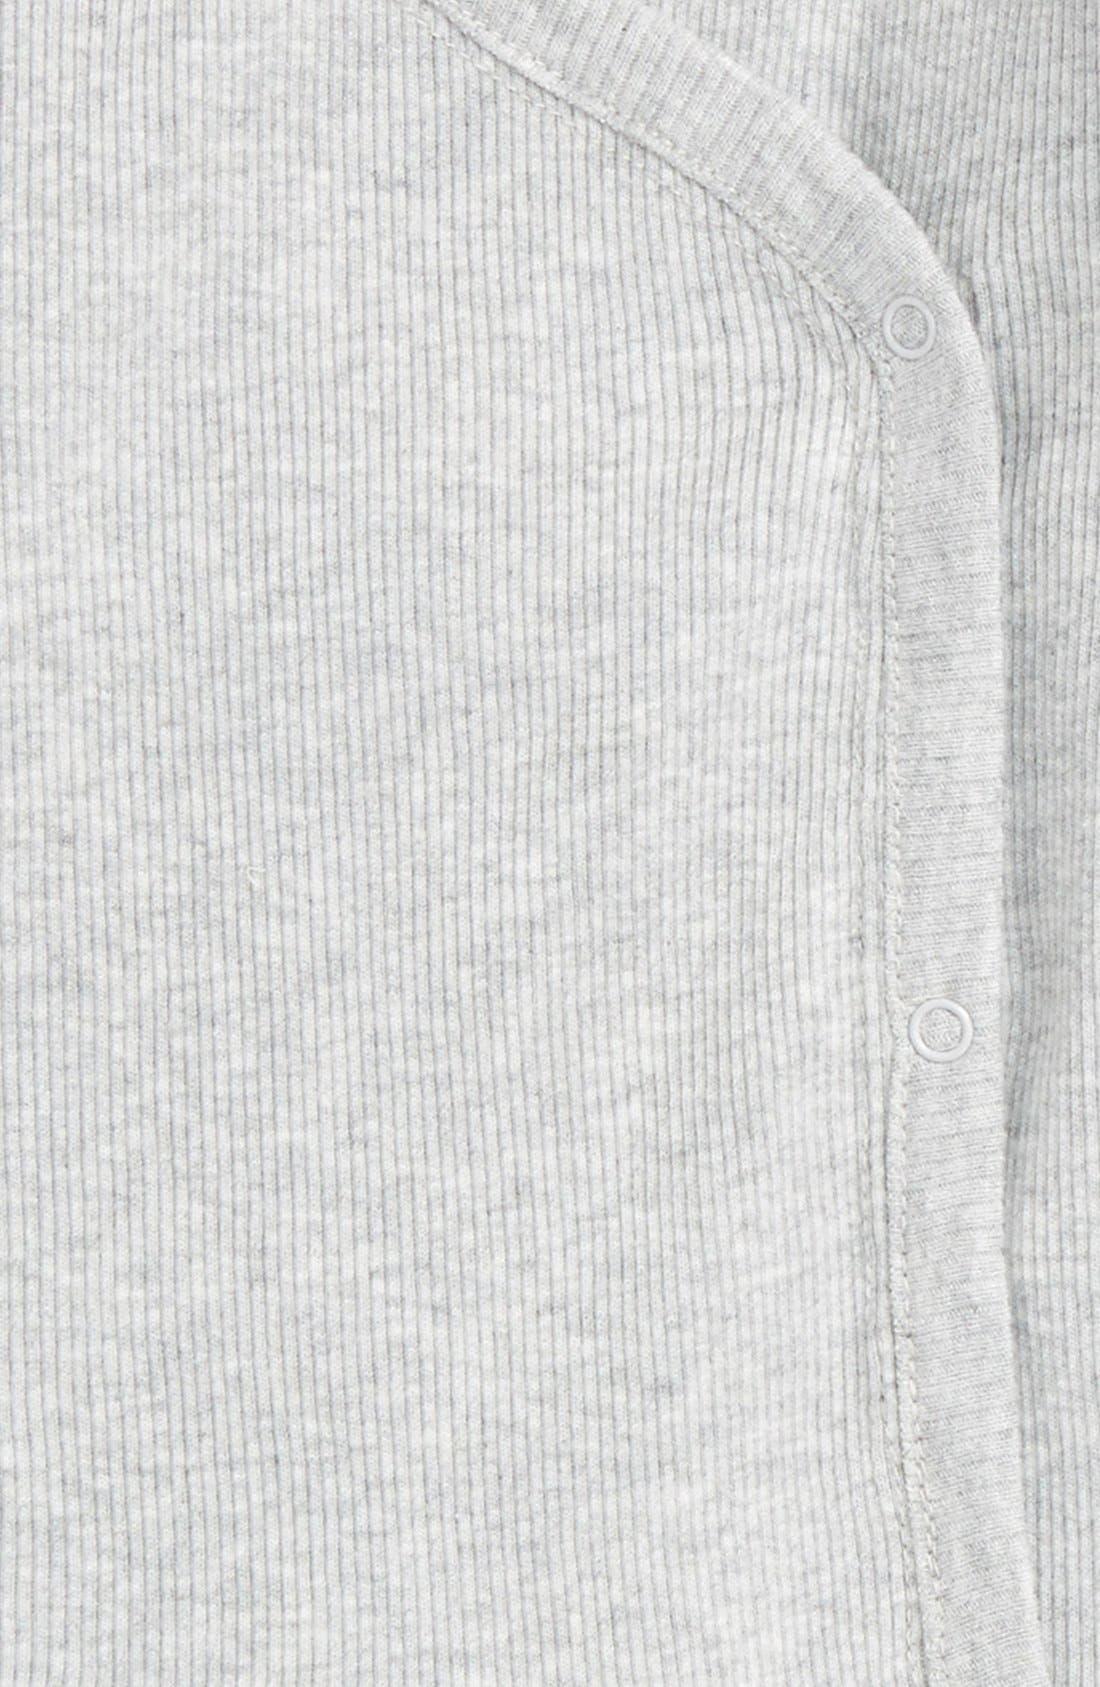 Rib Knit T-Shirt & Pants Set,                             Alternate thumbnail 3, color,                             GREY ASH HEATHER